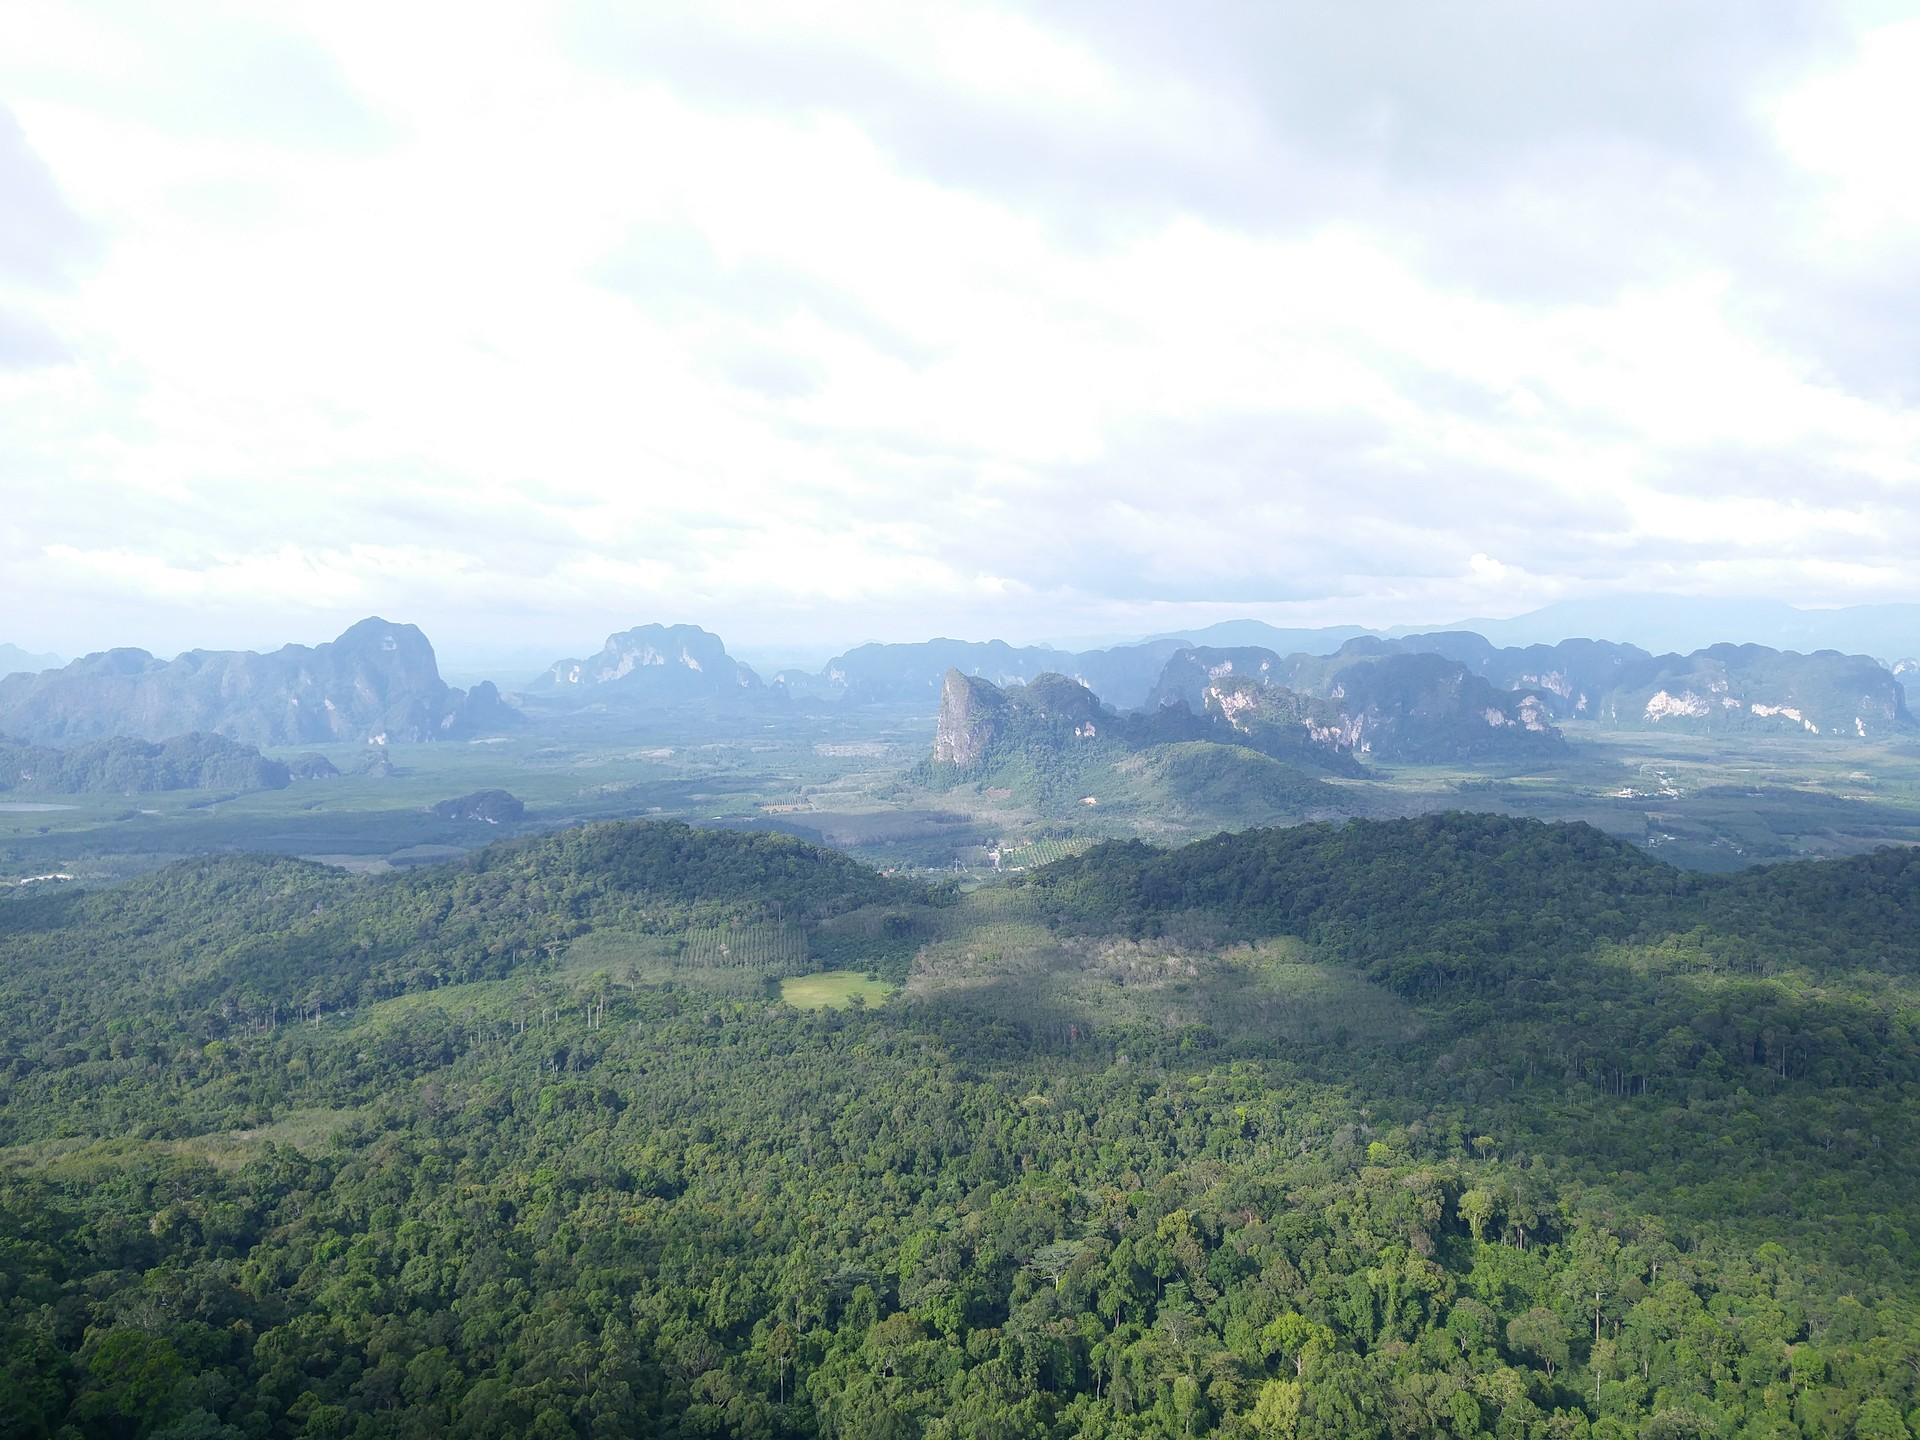 hiking-dragon-crest-mountain-trail-88f8b